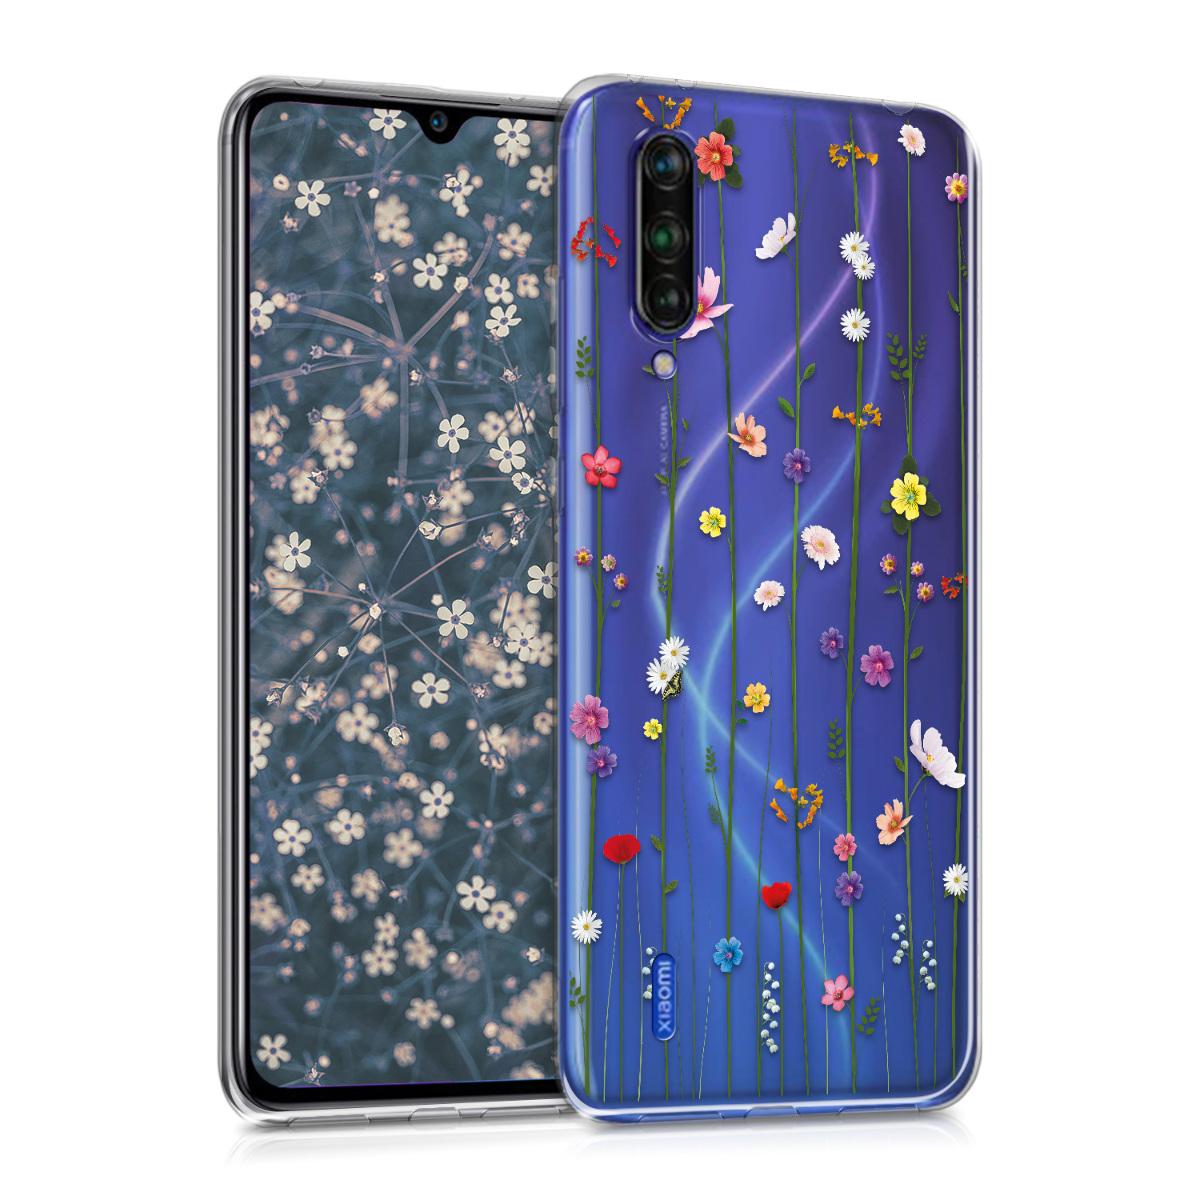 KW Θήκη Σιλικόνης Xiaomi Mi 9 Lite - Multicolor / Transparent (50608.01)